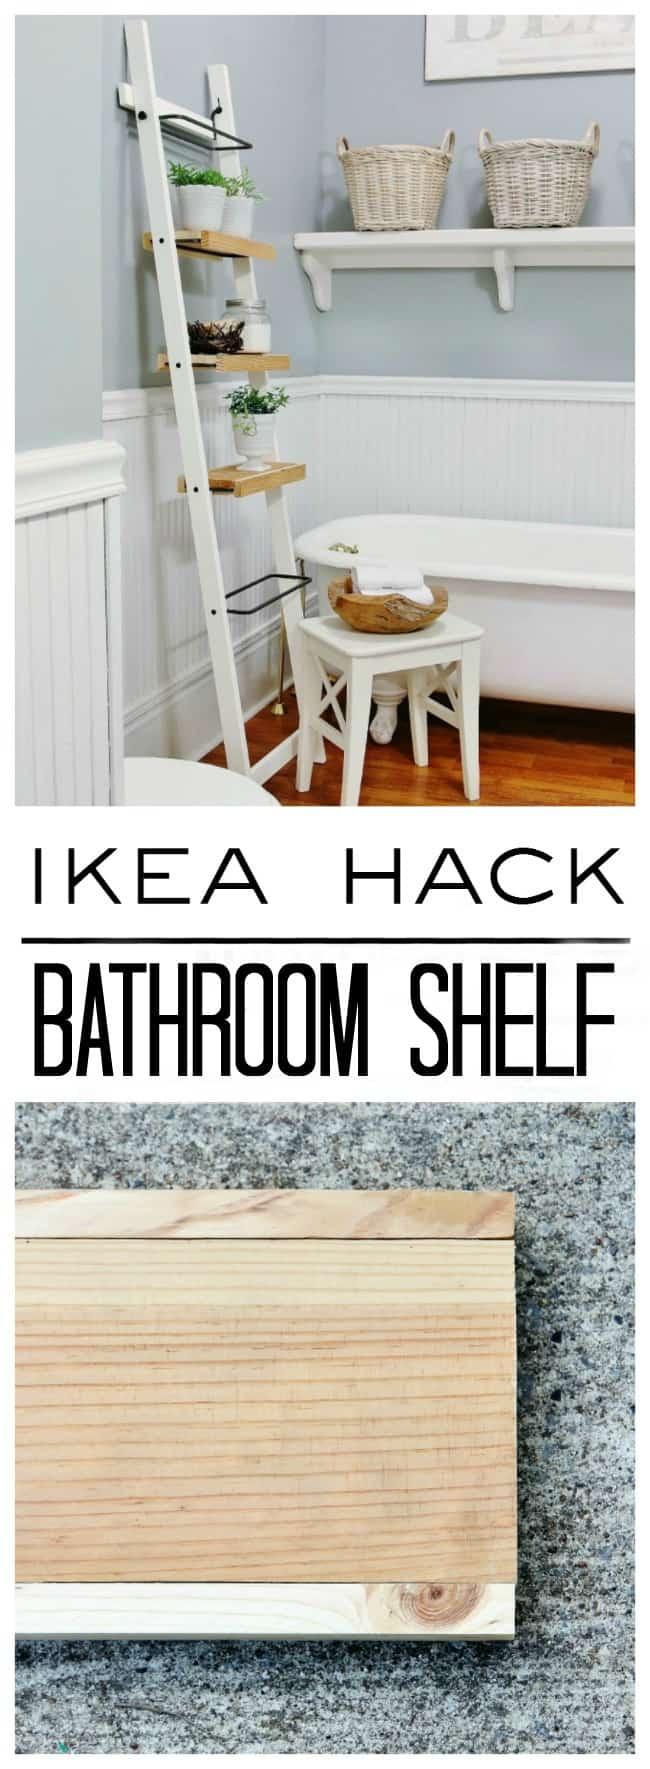 IKEA Hack Bathroom Shelf Project